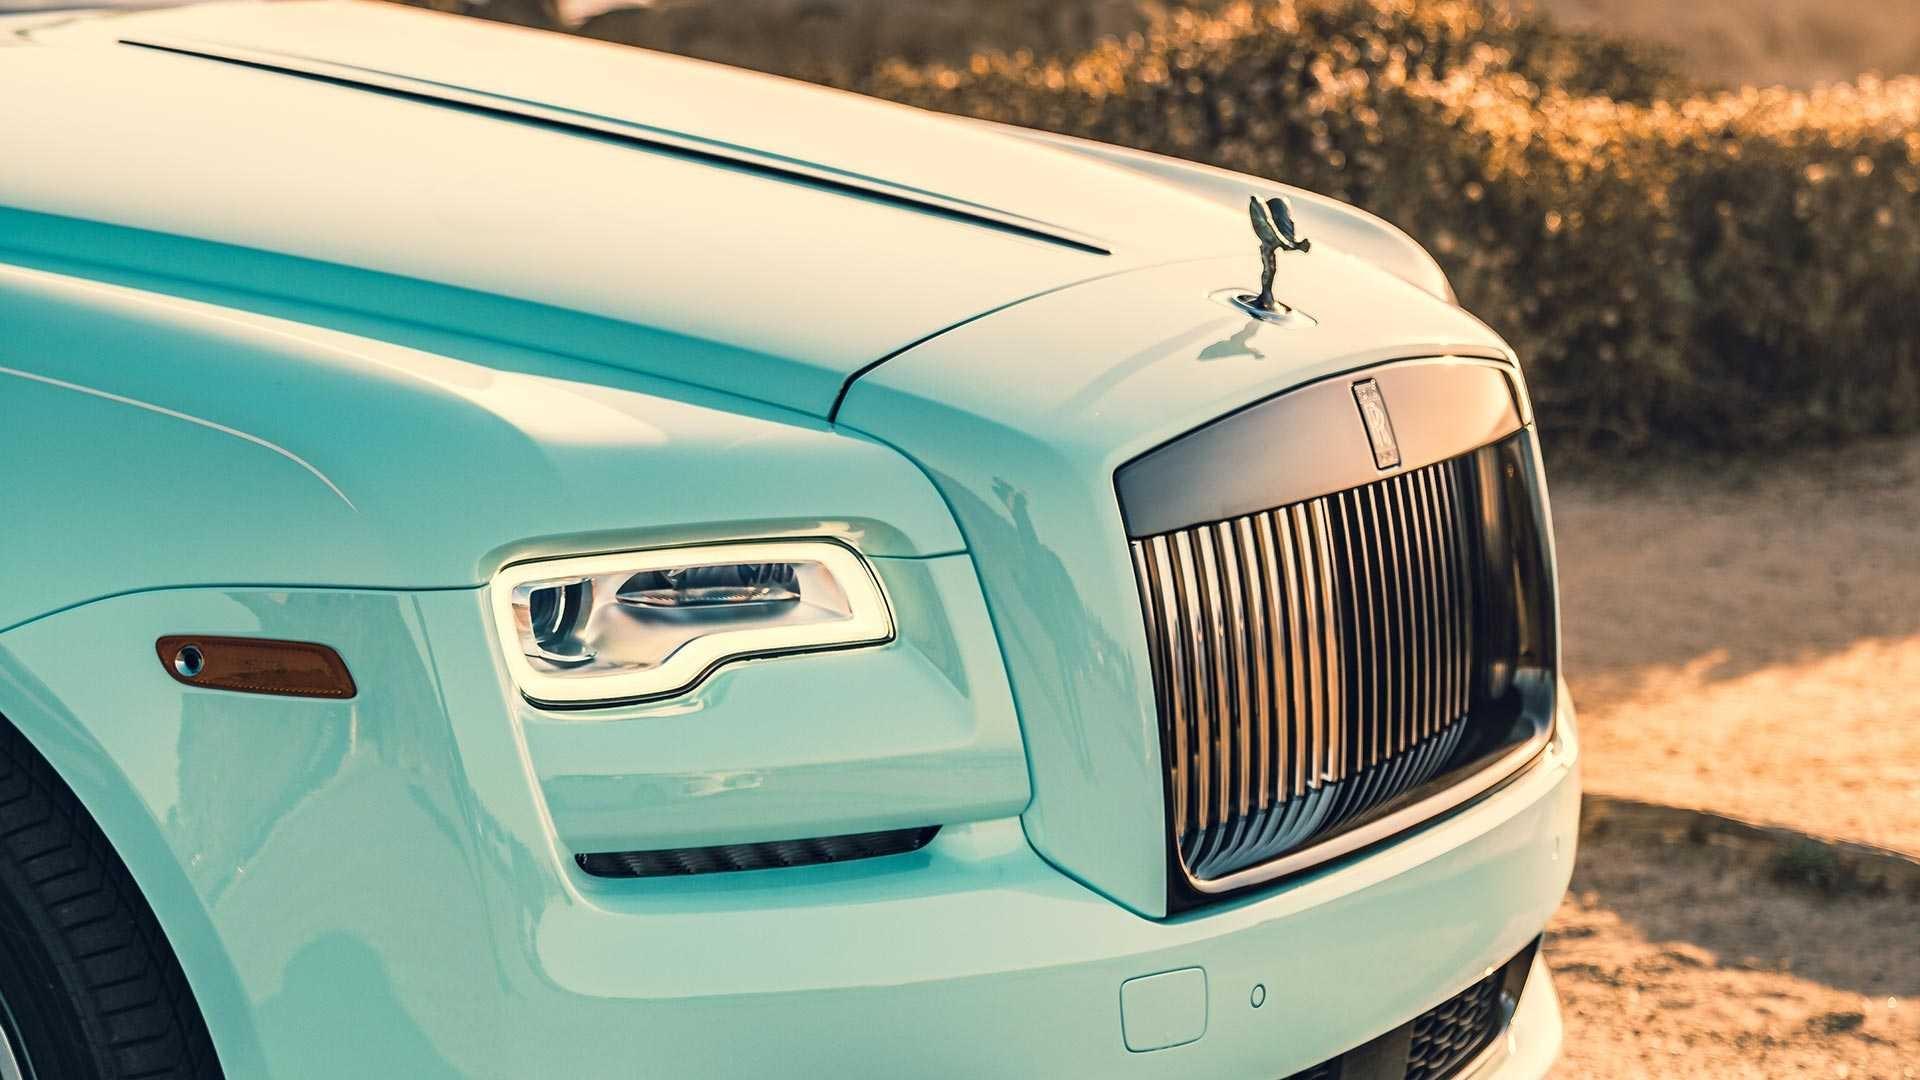 Ngam bo suu tap Rolls-Royce dac biet 'Dem Moscow' hinh anh 32